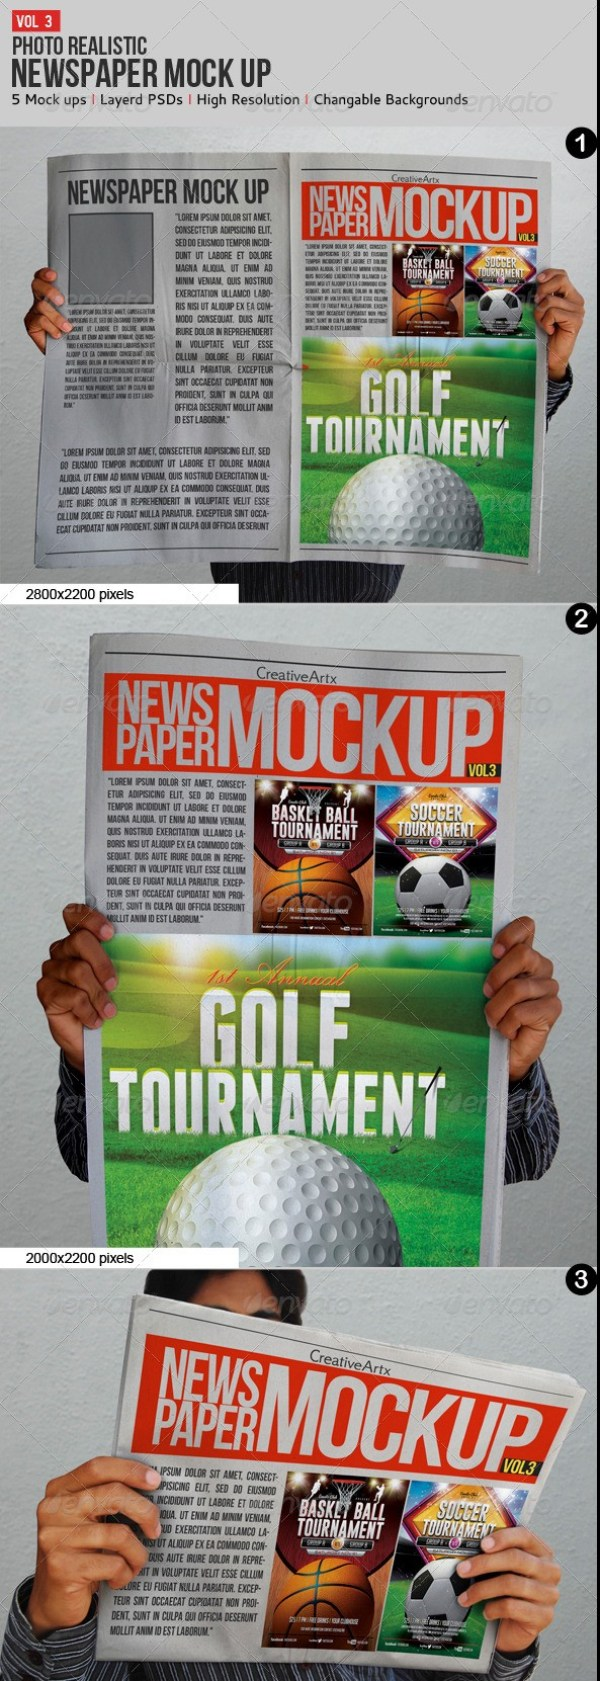 Newspaper Mockup V.3